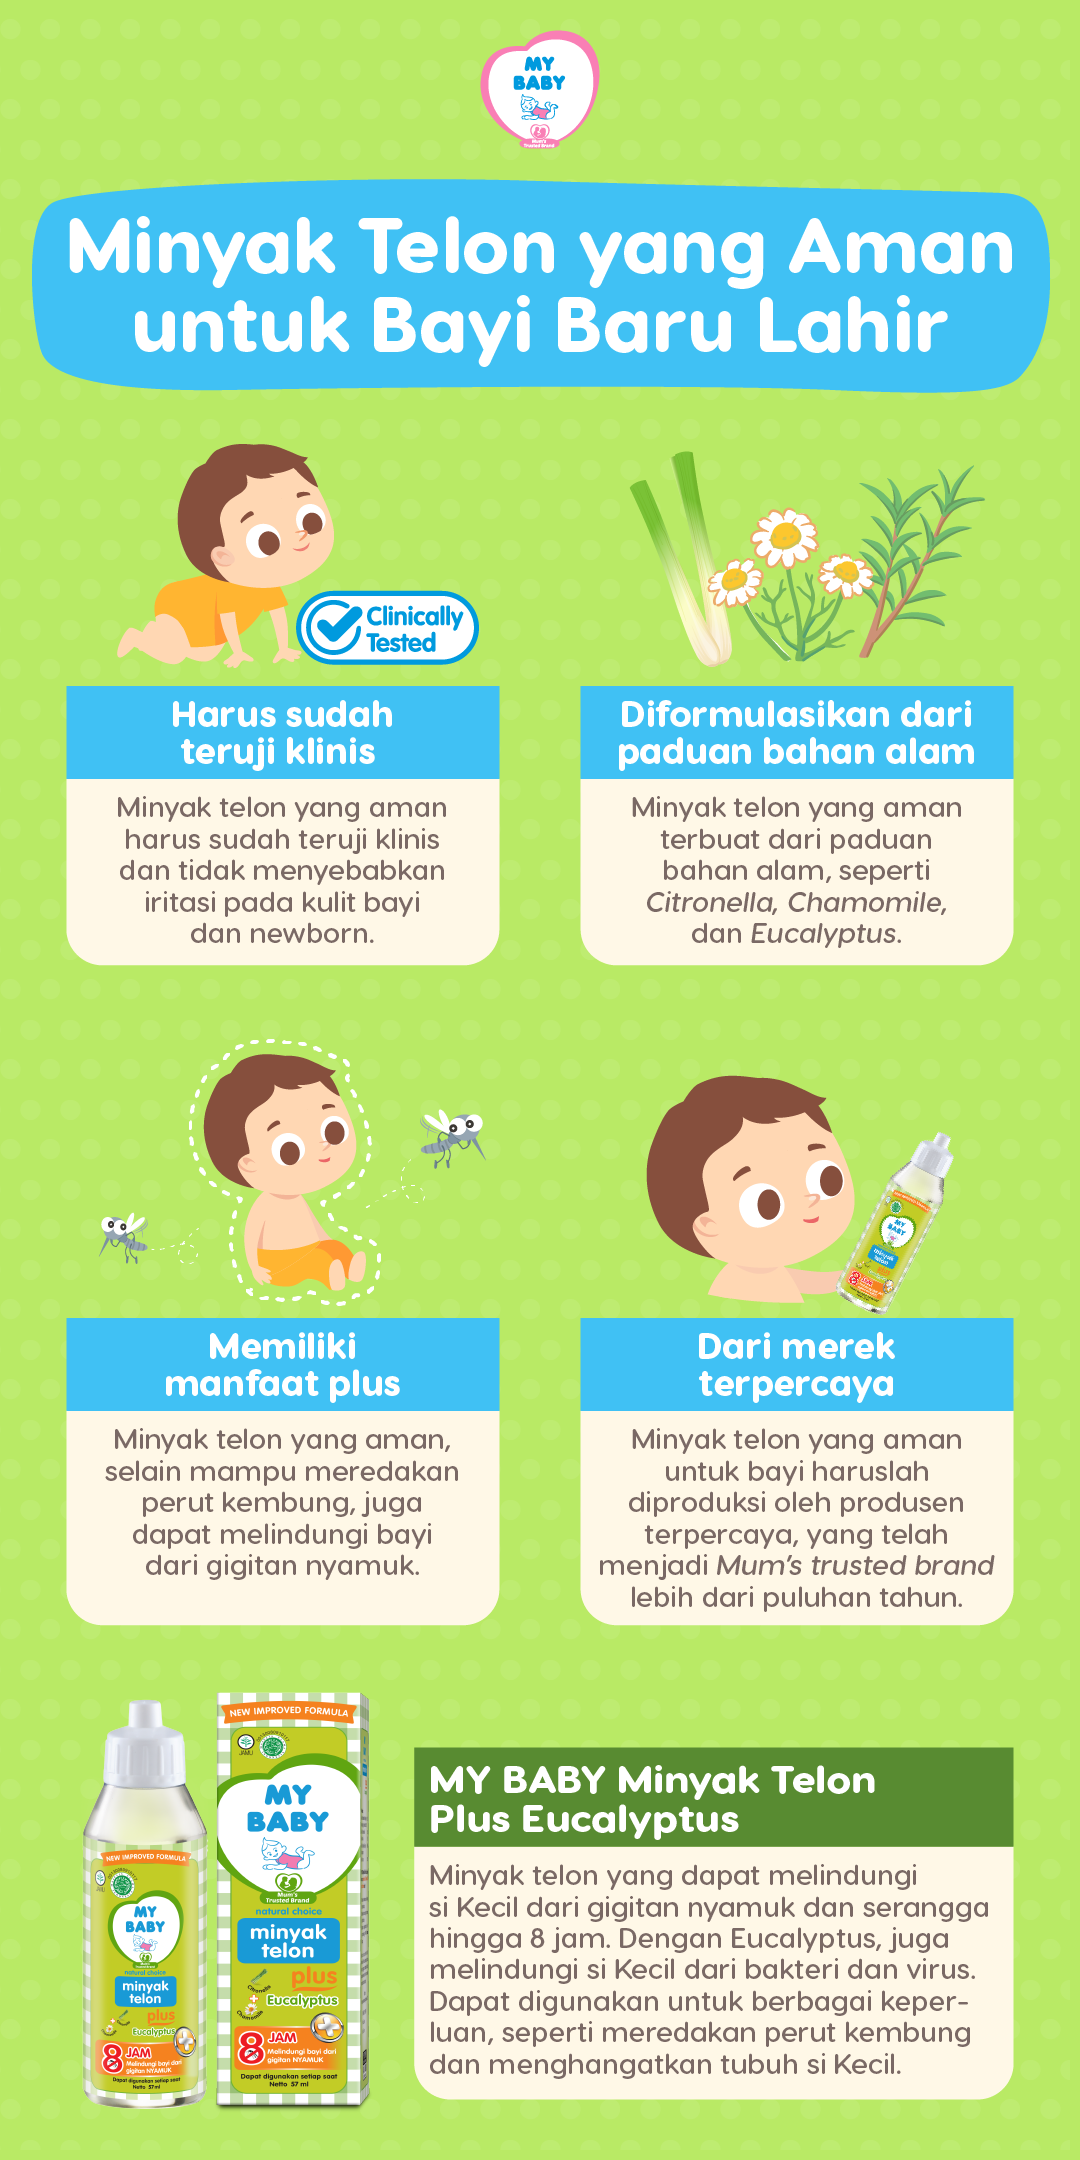 Minyak Telon yang Aman untuk Bayi Baru Lahir